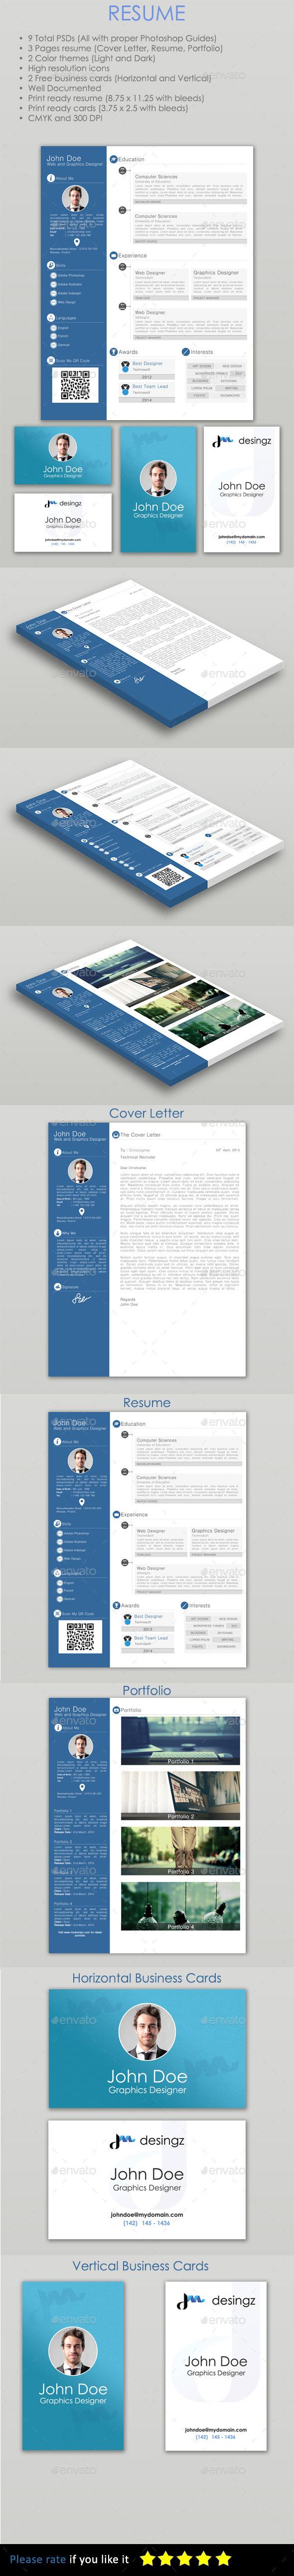 Resume - PSD Template